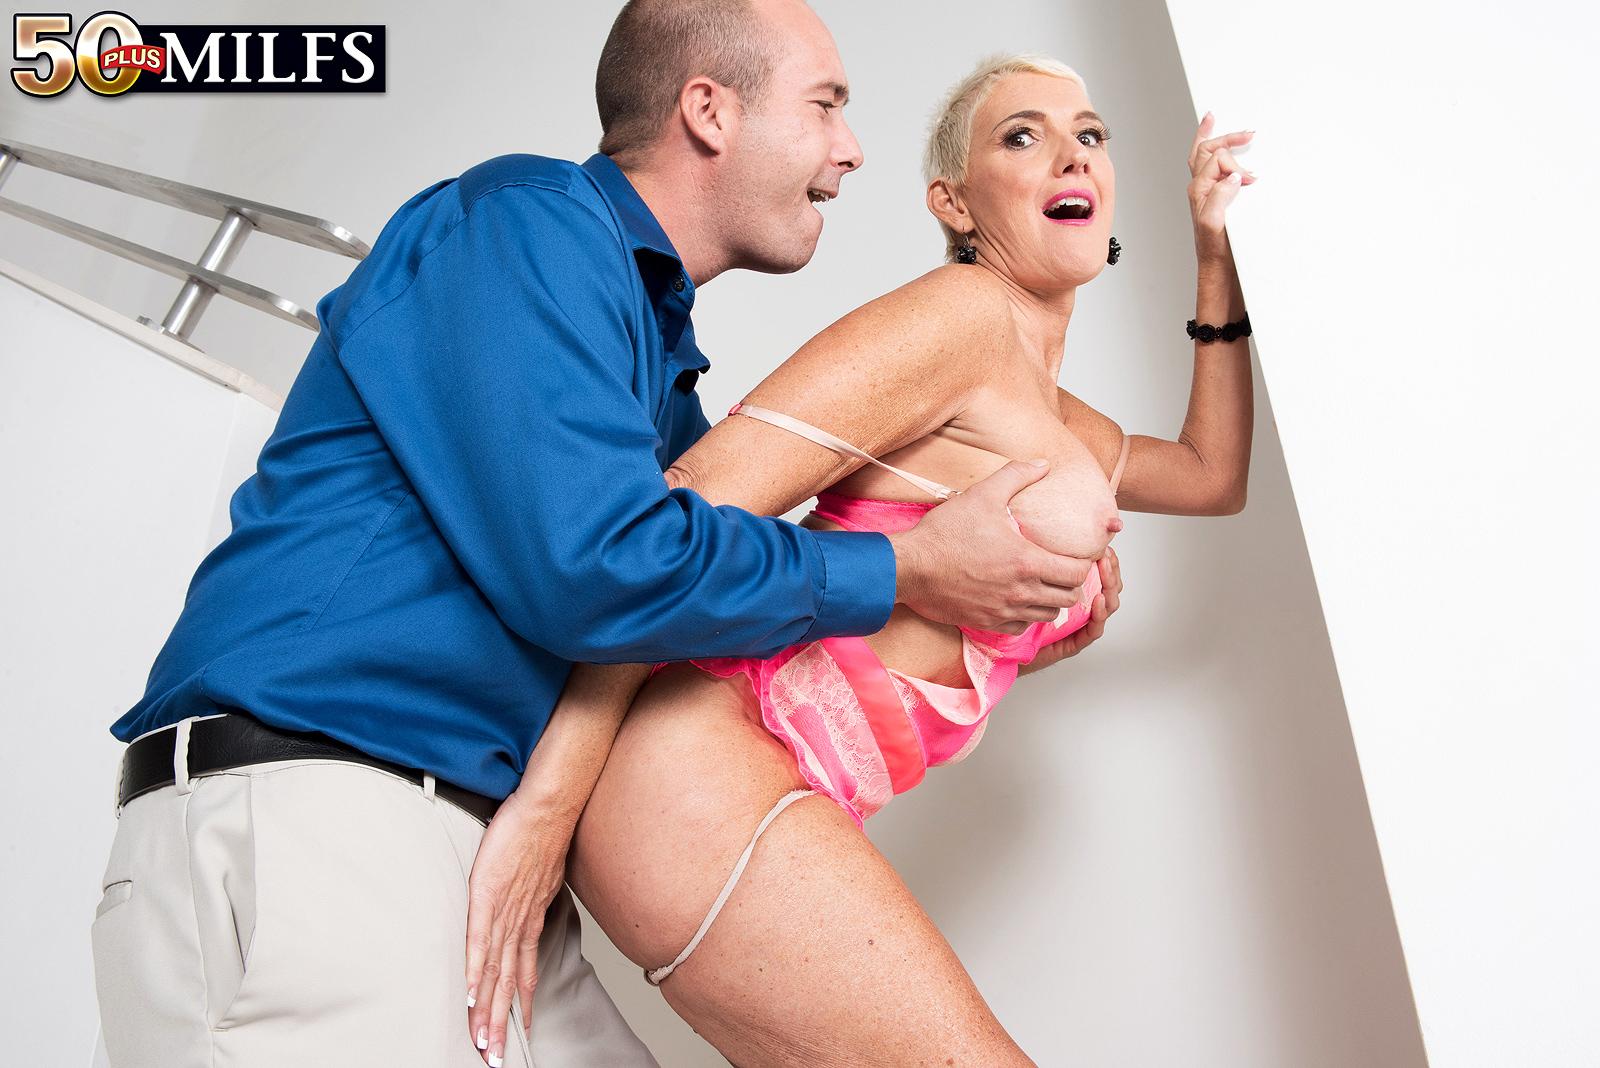 50 Porn Free free porn samples of 50 plus milfs - mature old women sex porn